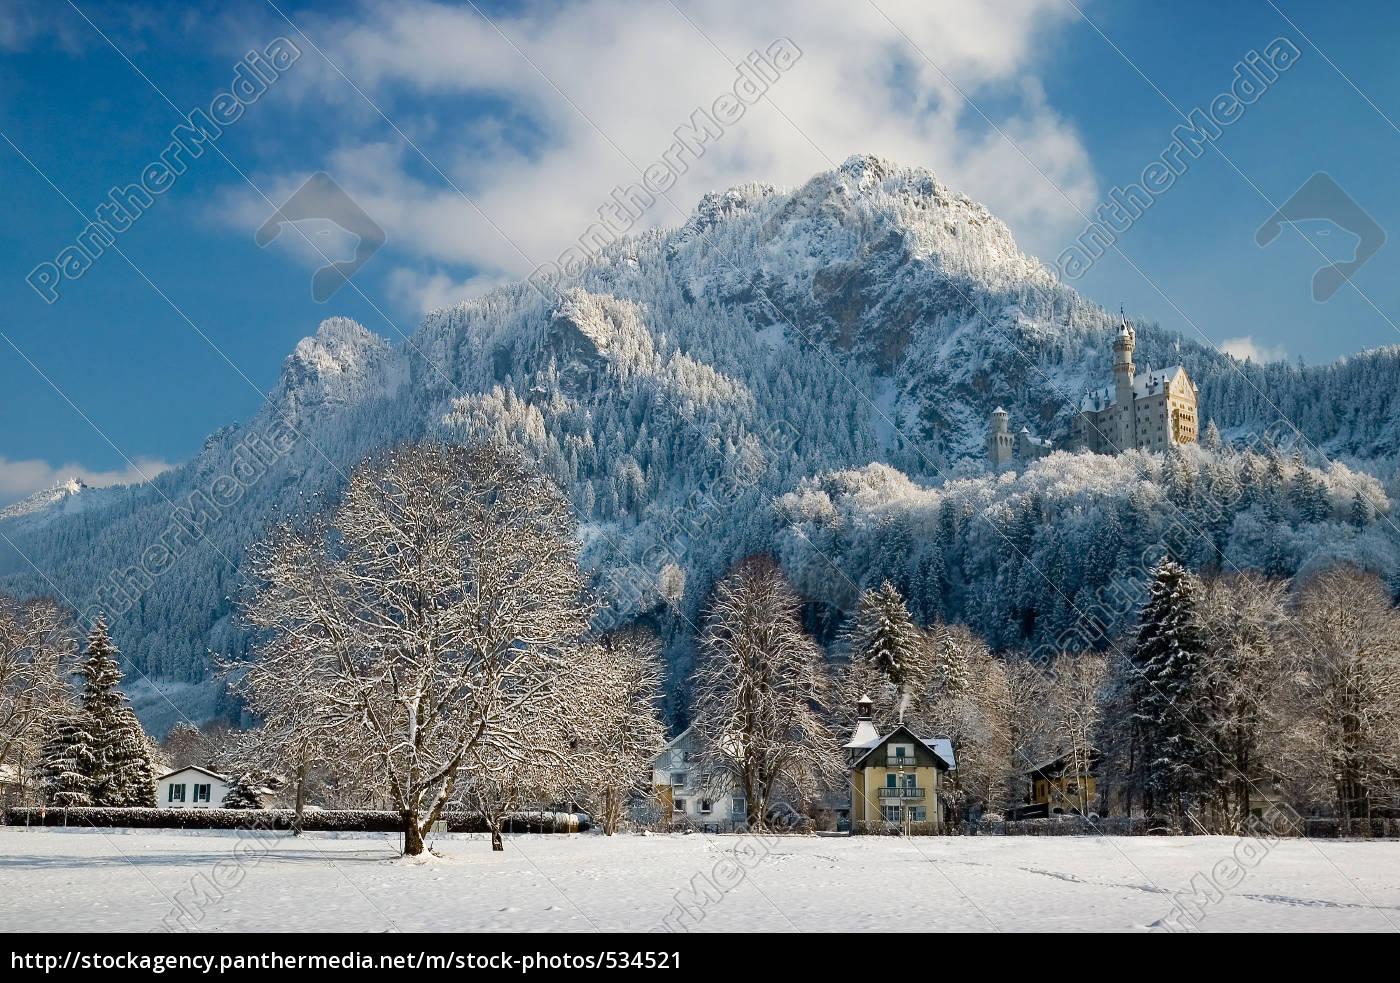 majestic, winter - 534521